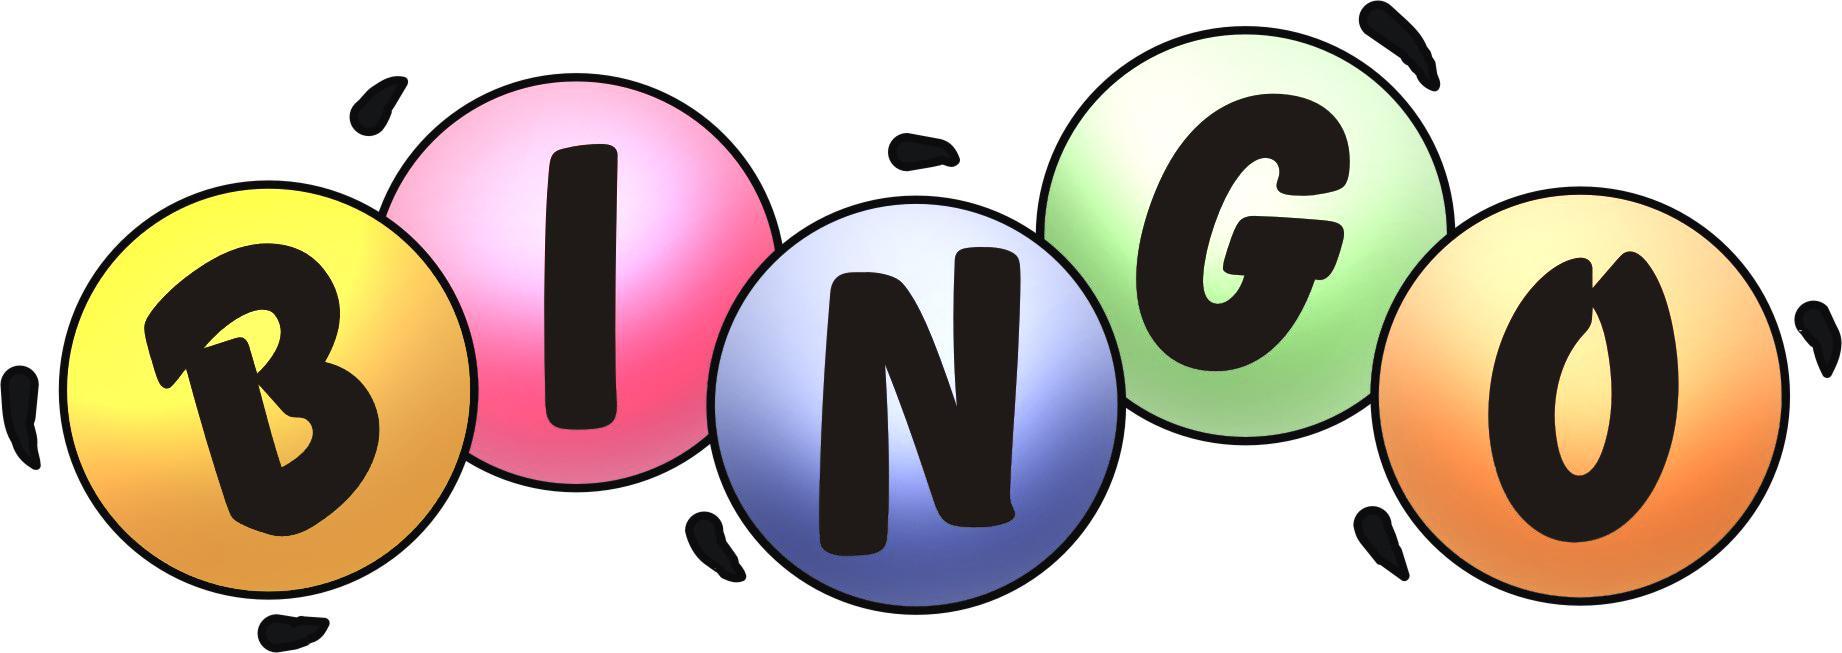 Bingo Cards Clip Art. Bingo Cancelled On Friday 3 15 And Friday 2 29 Pelhamseniorsblog